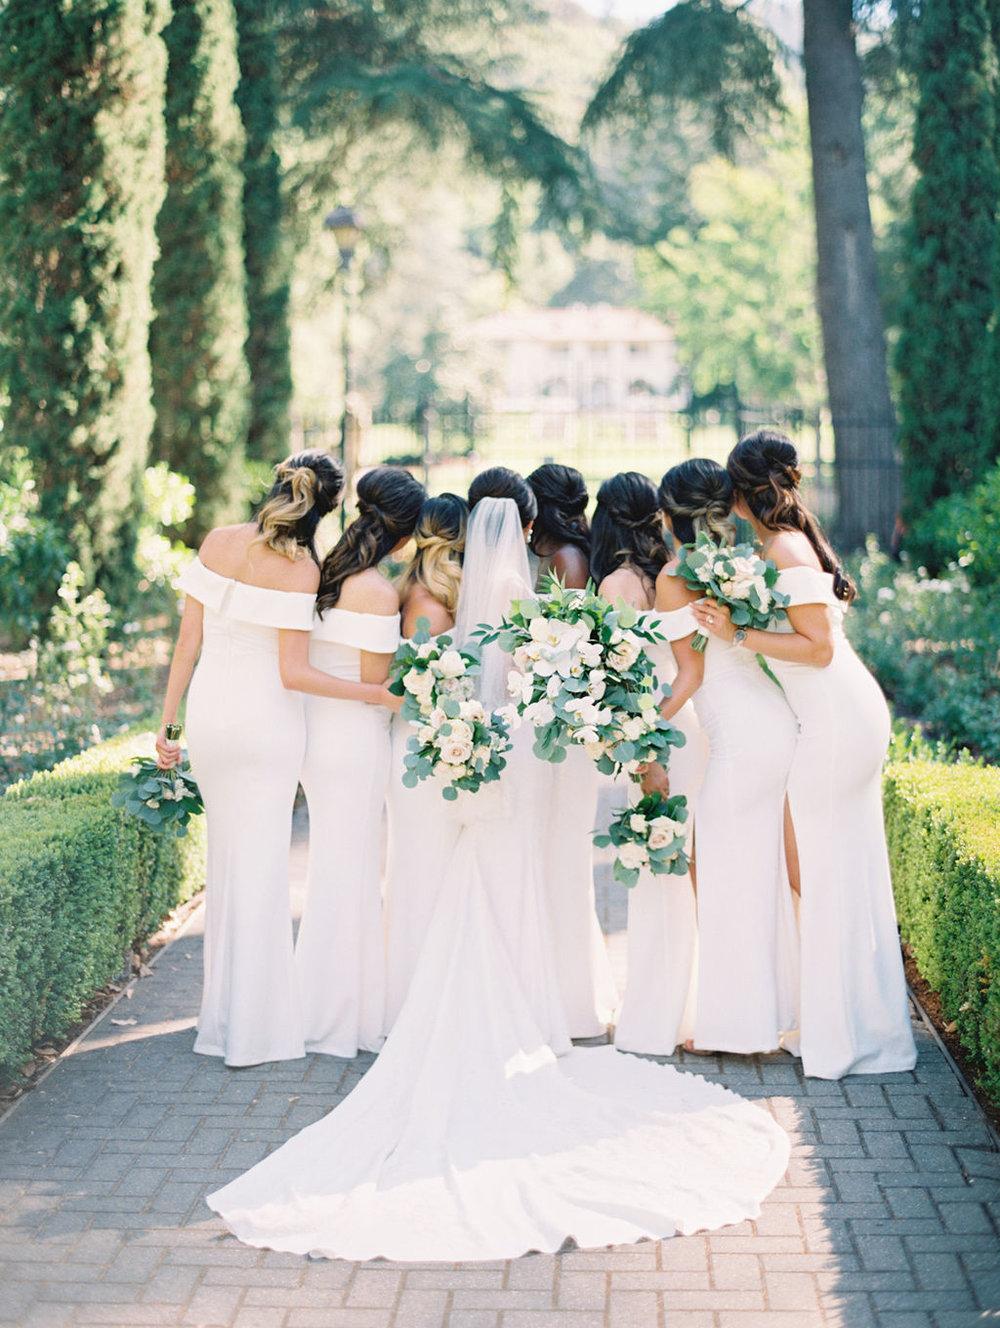 Film Destination Wedding California Fine Art Photographer Jenny Soi - All White Wedding at Villa Montalvo Saratoga, CA